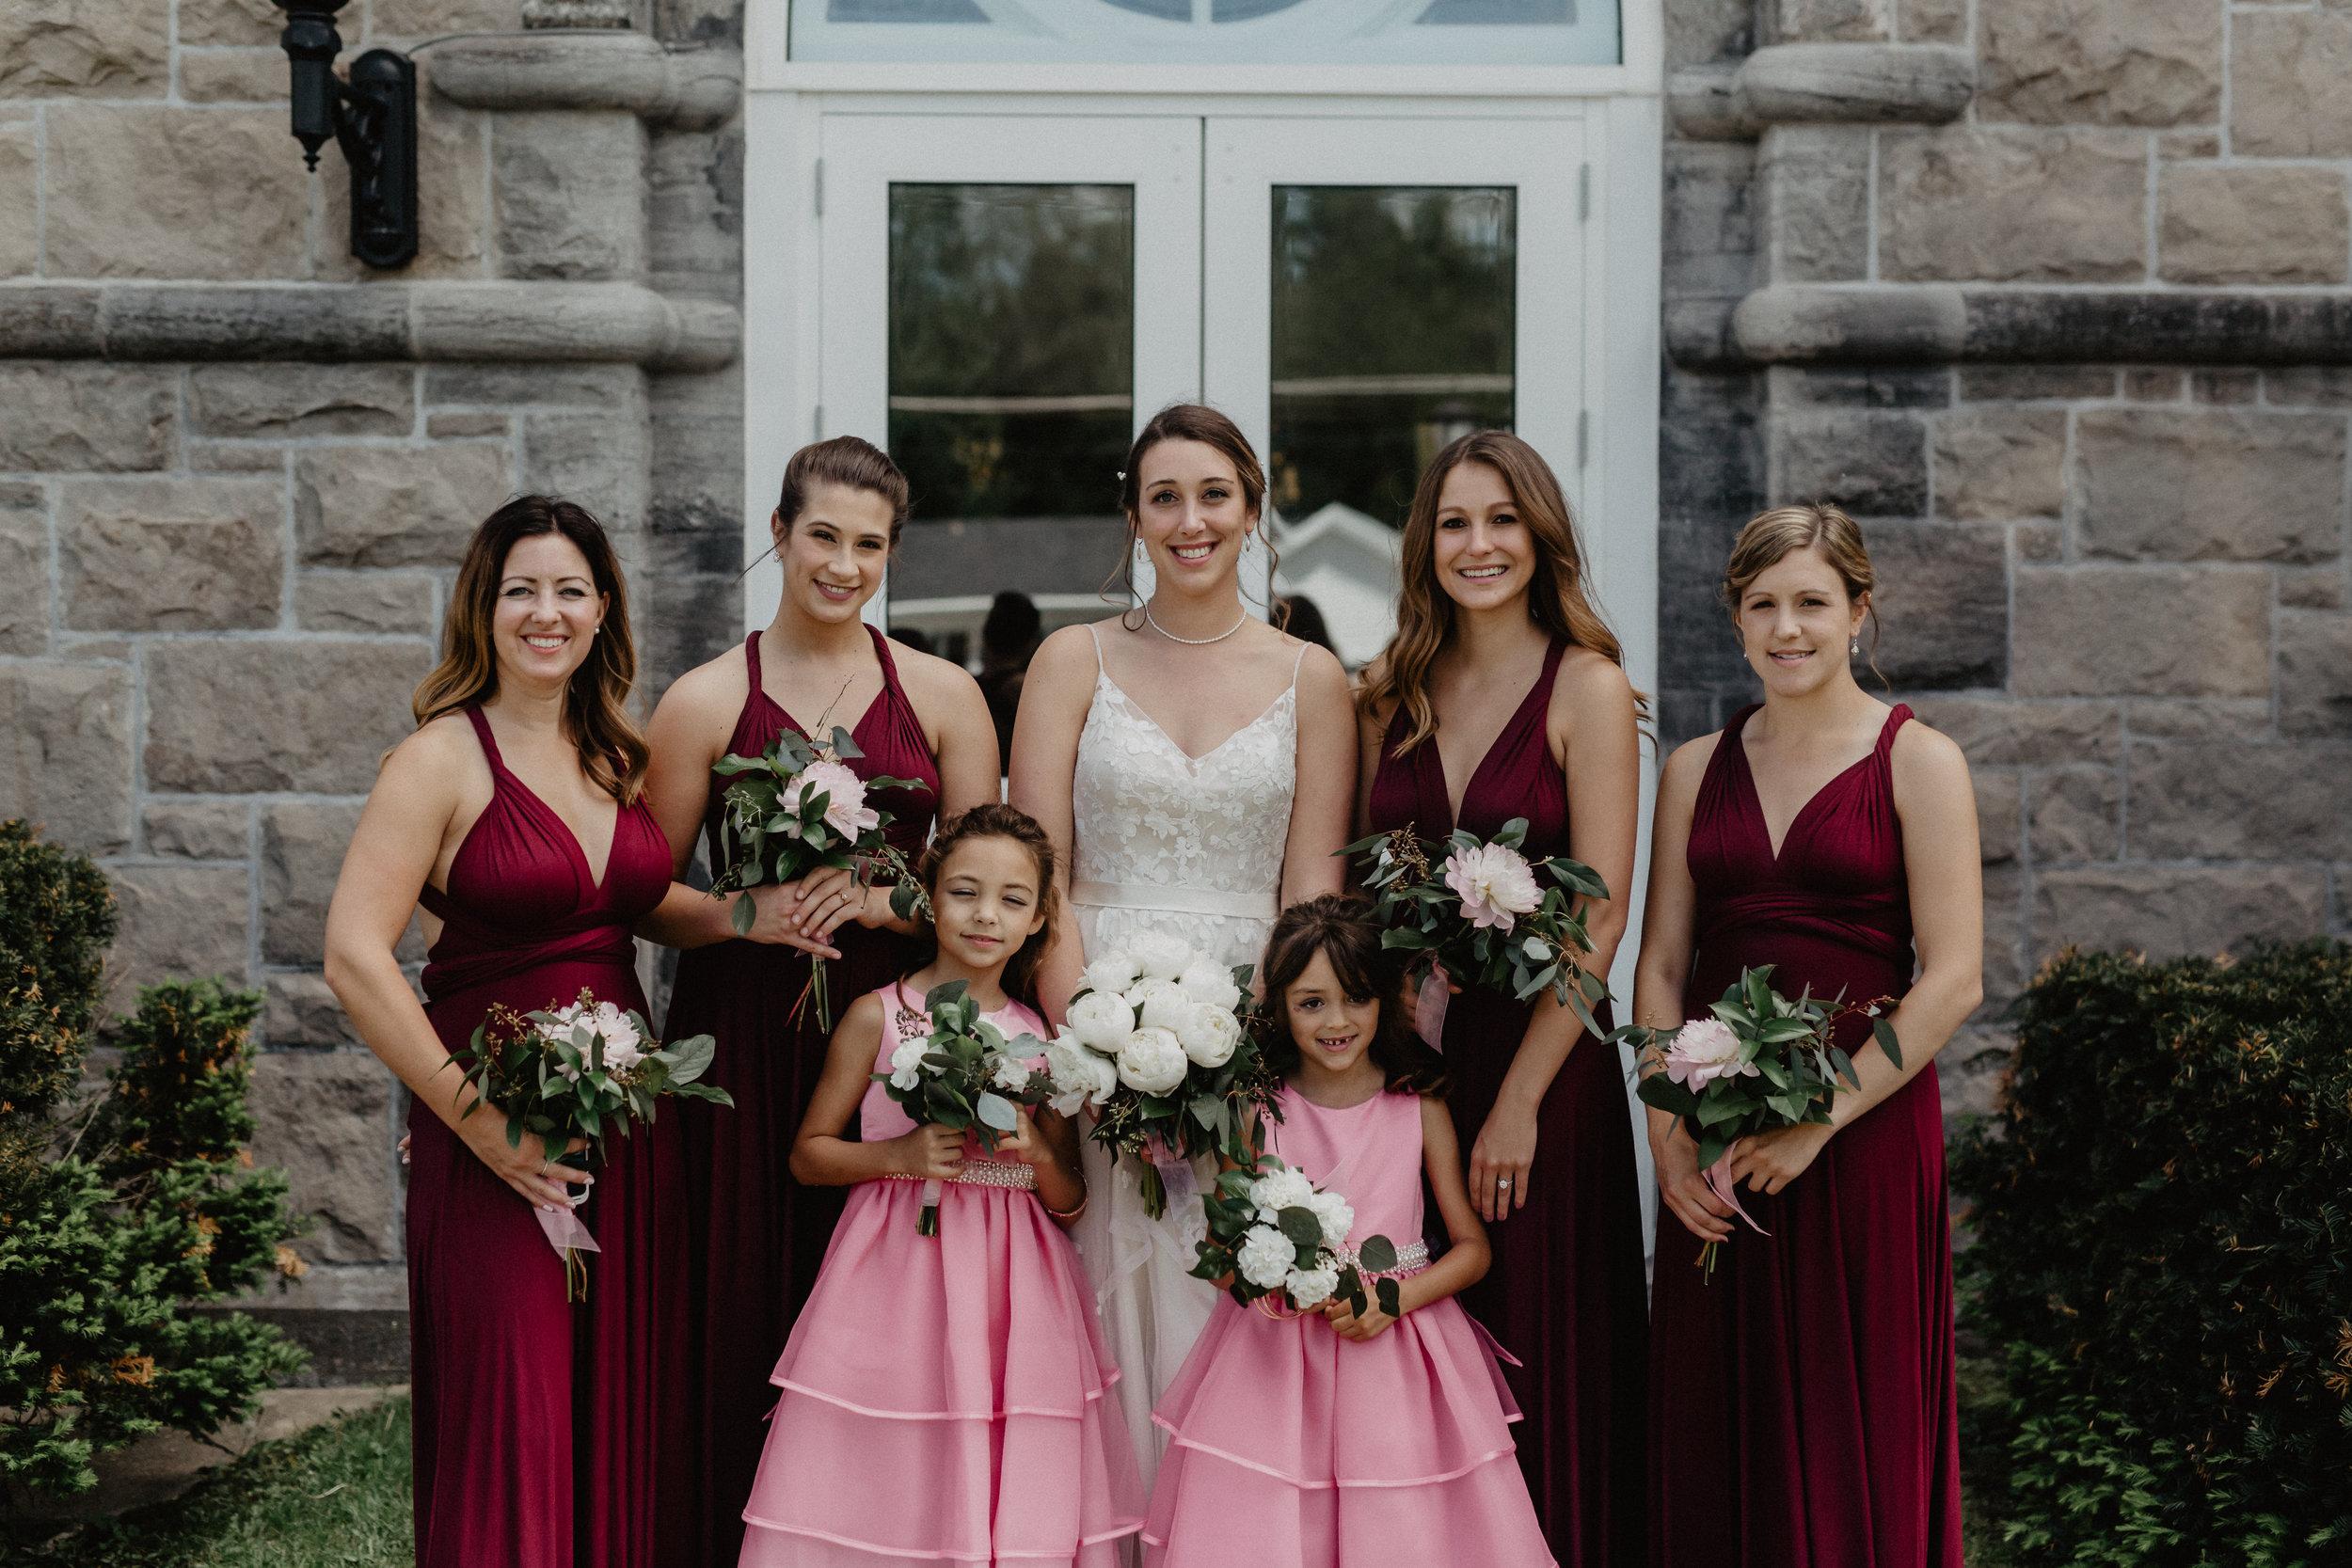 upstate_ny_wedding-34.jpg